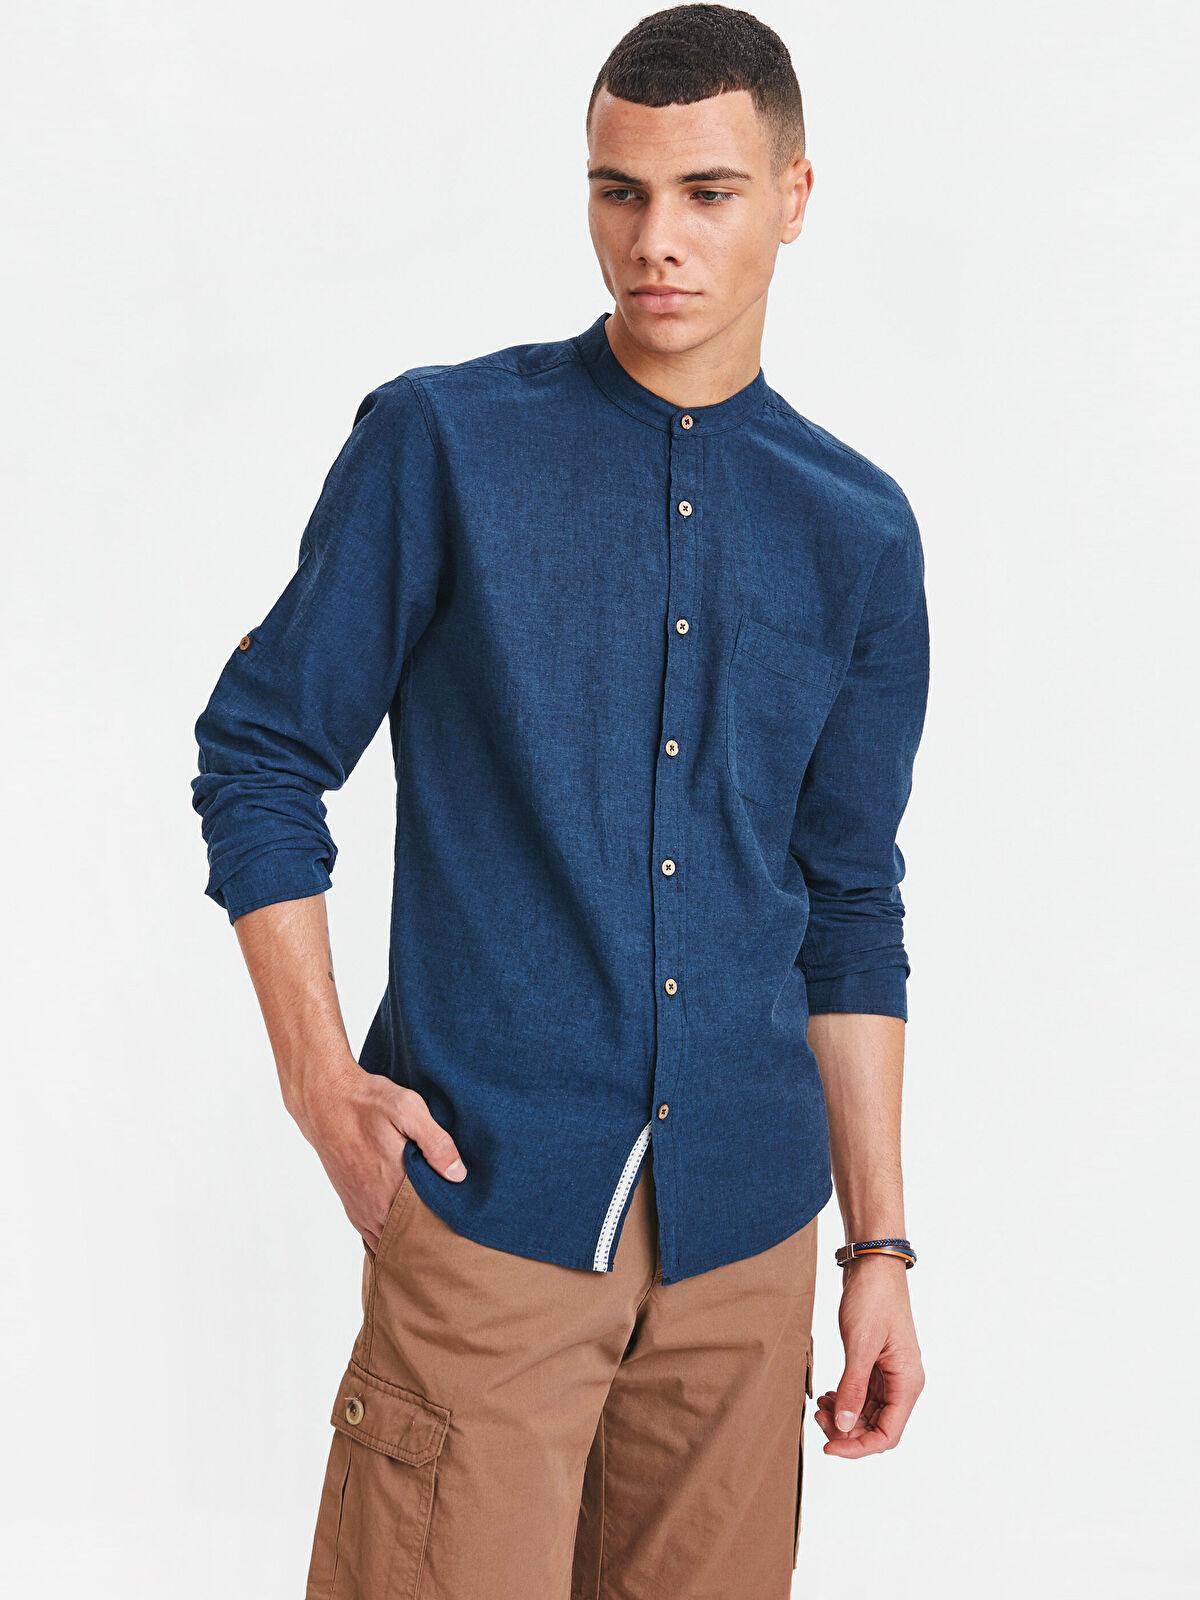 Extra Slim Fit Uzun Kollu Keten Karışımlı Gömlek - LC WAIKIKI